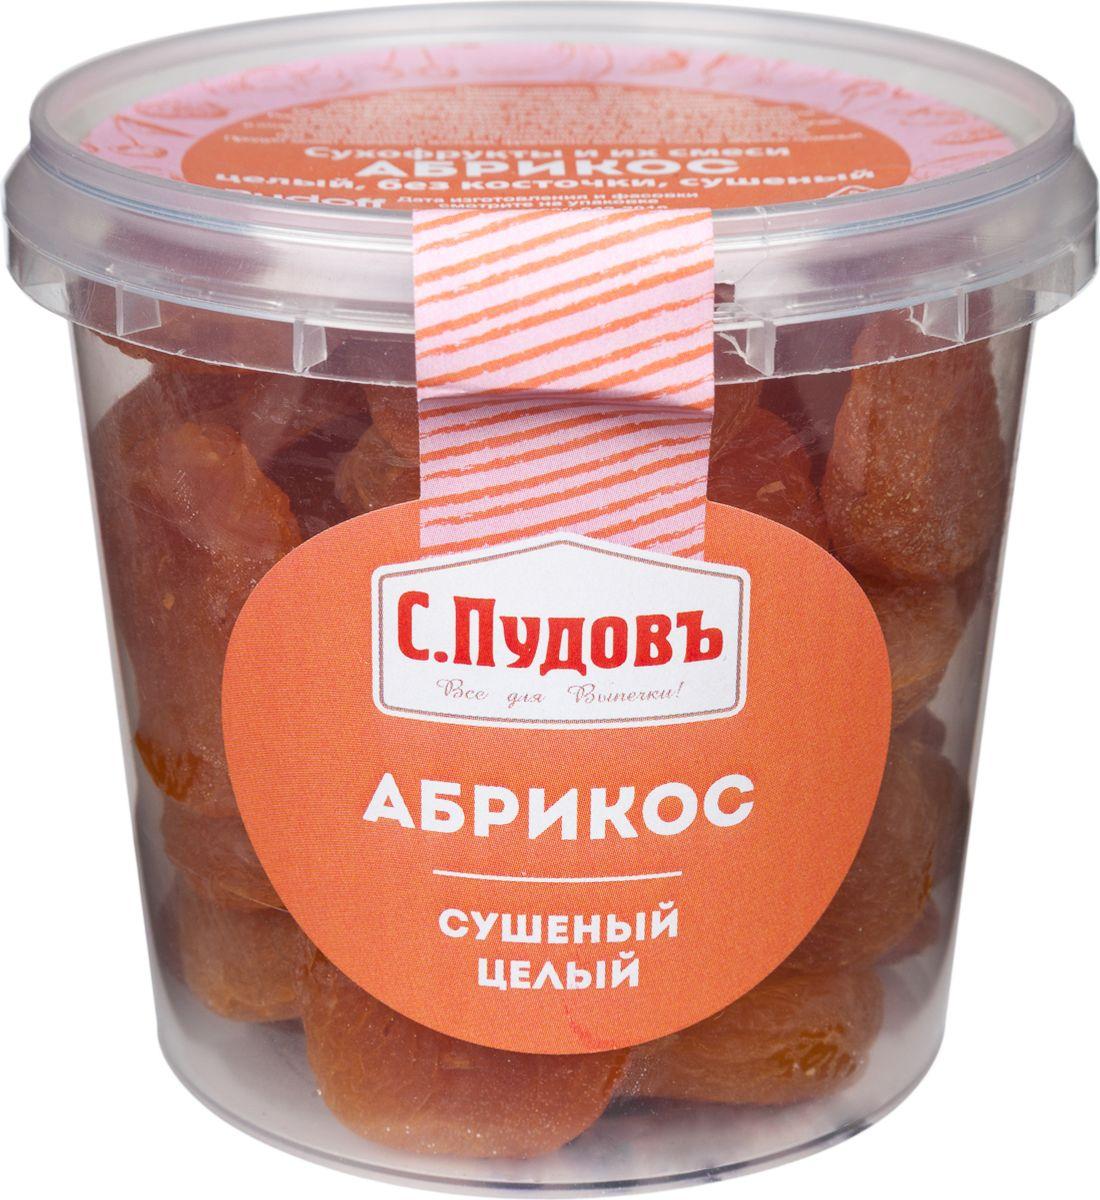 Пудовъ абрикос сушеный целый, 250 г пудовъ петрушка сушеная 15 г